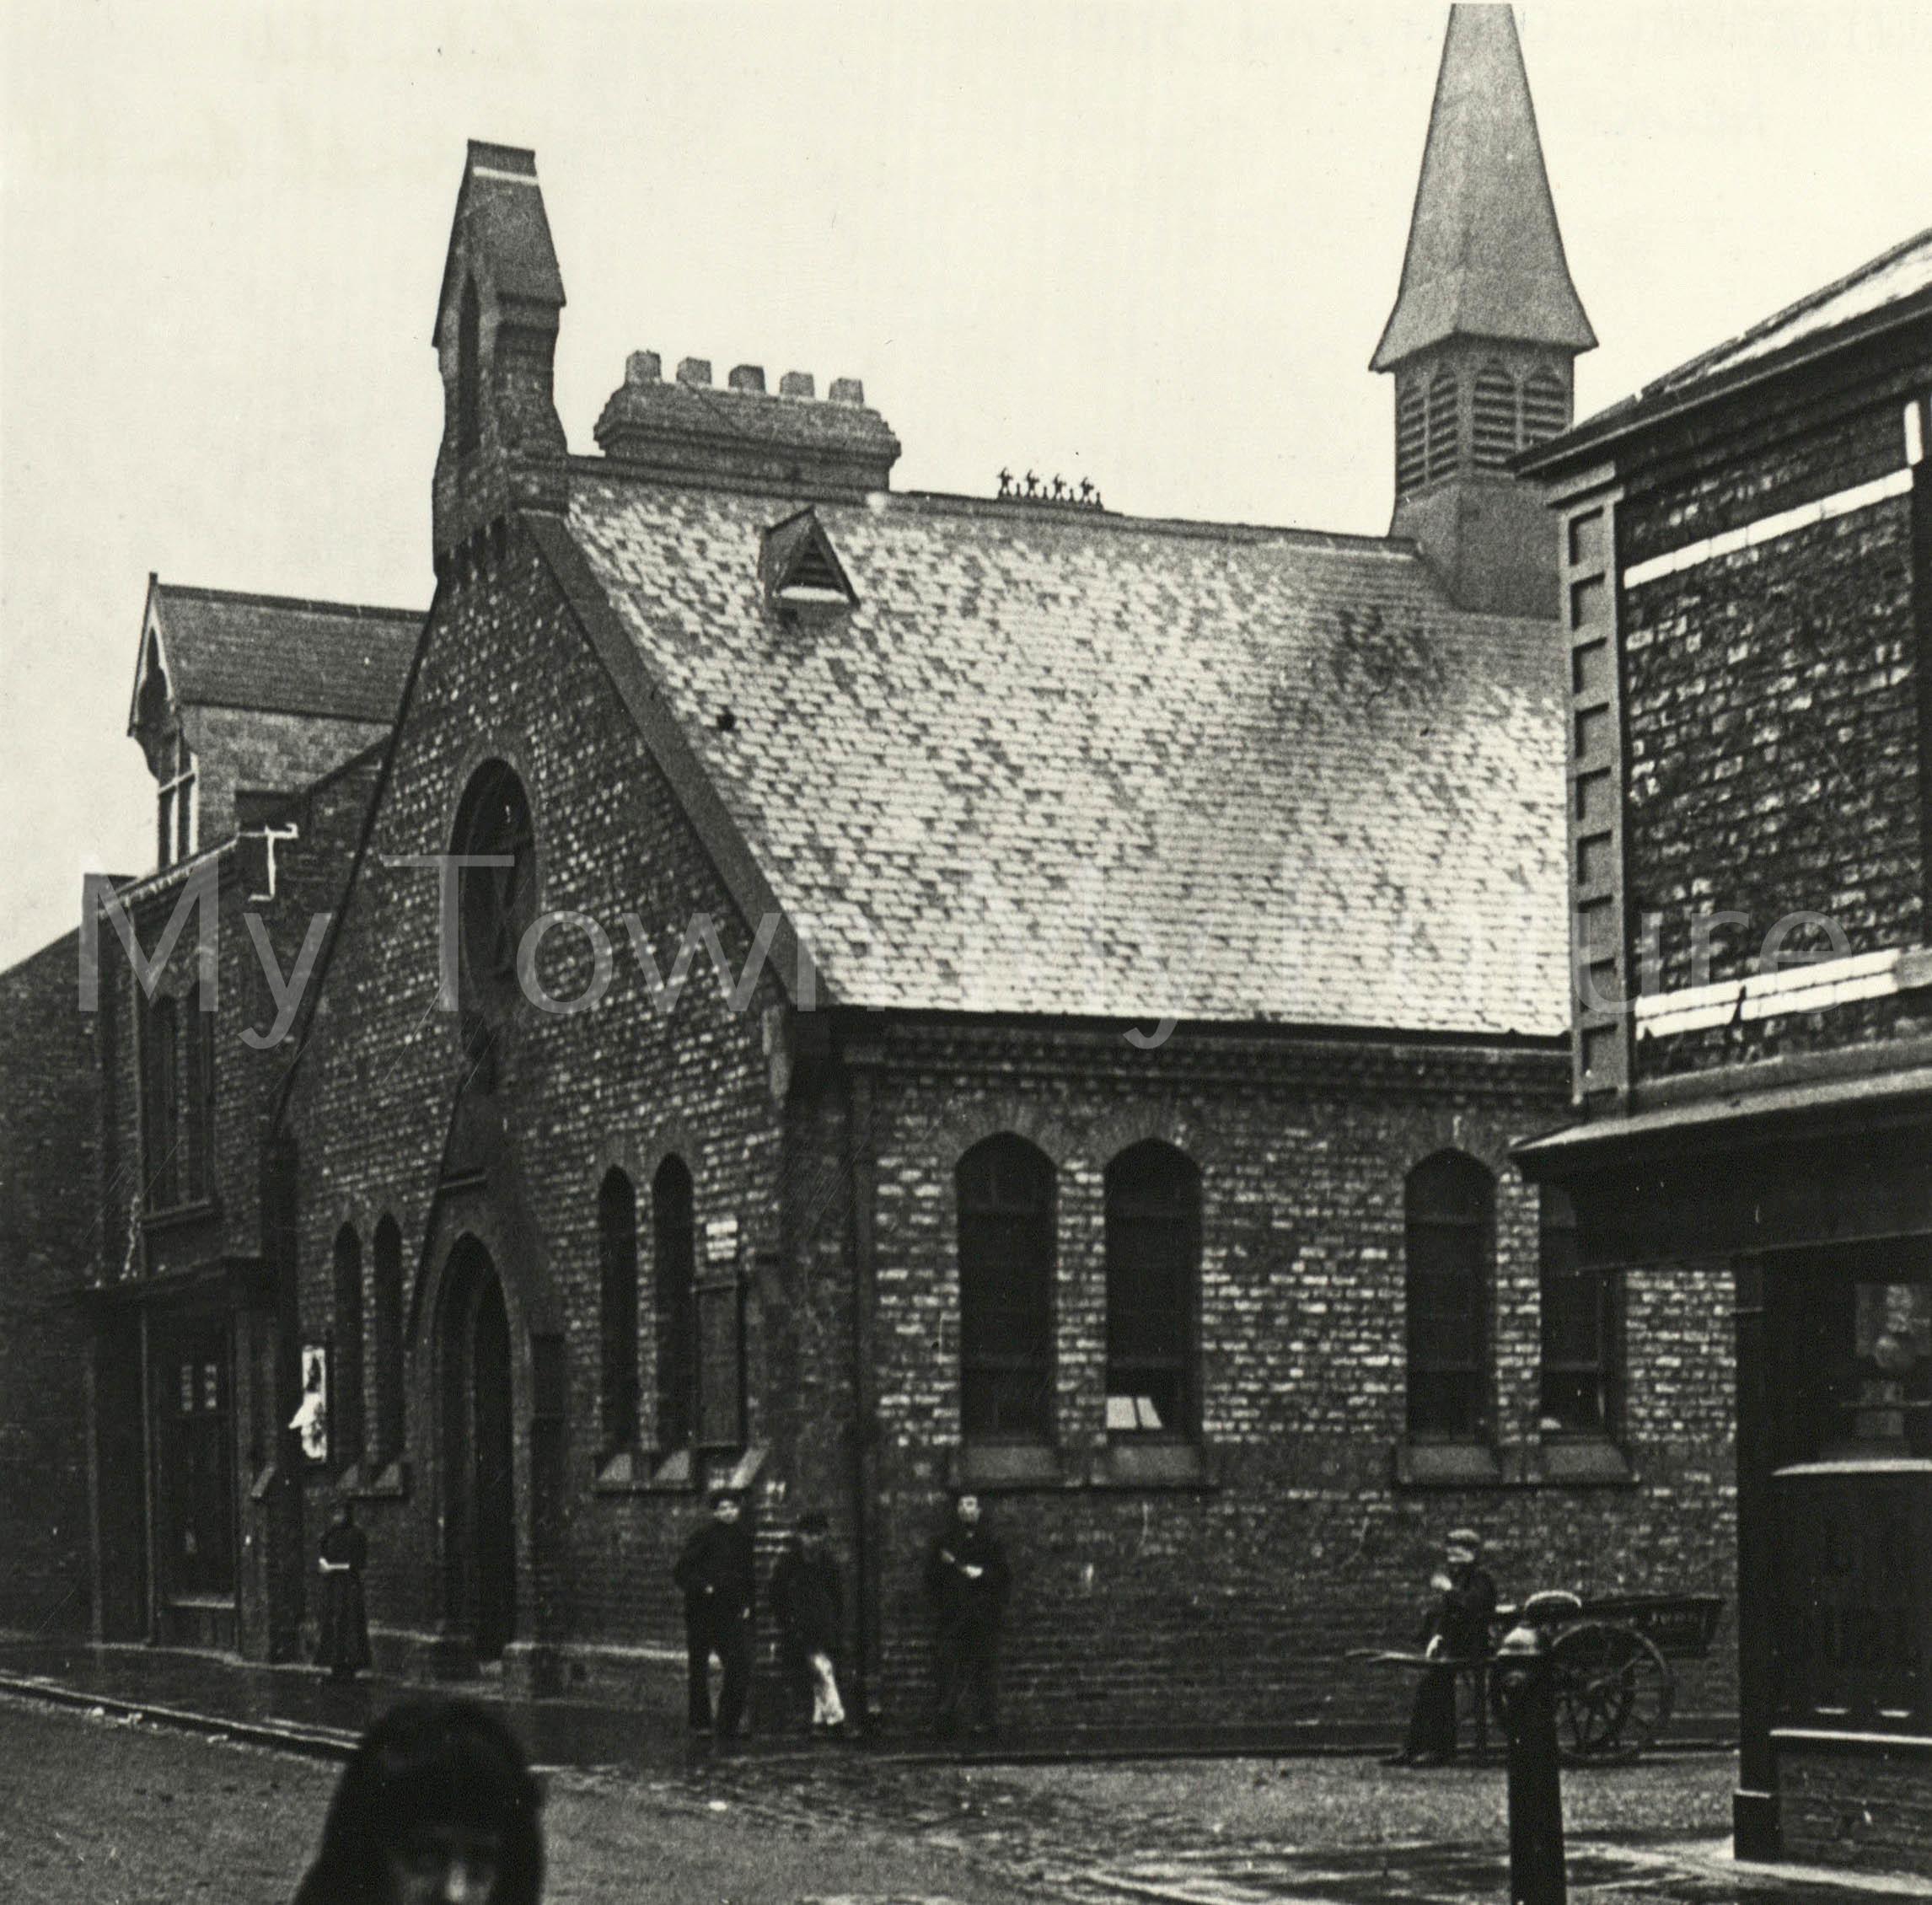 St Oswald's Mission Lower Dean Street Newport